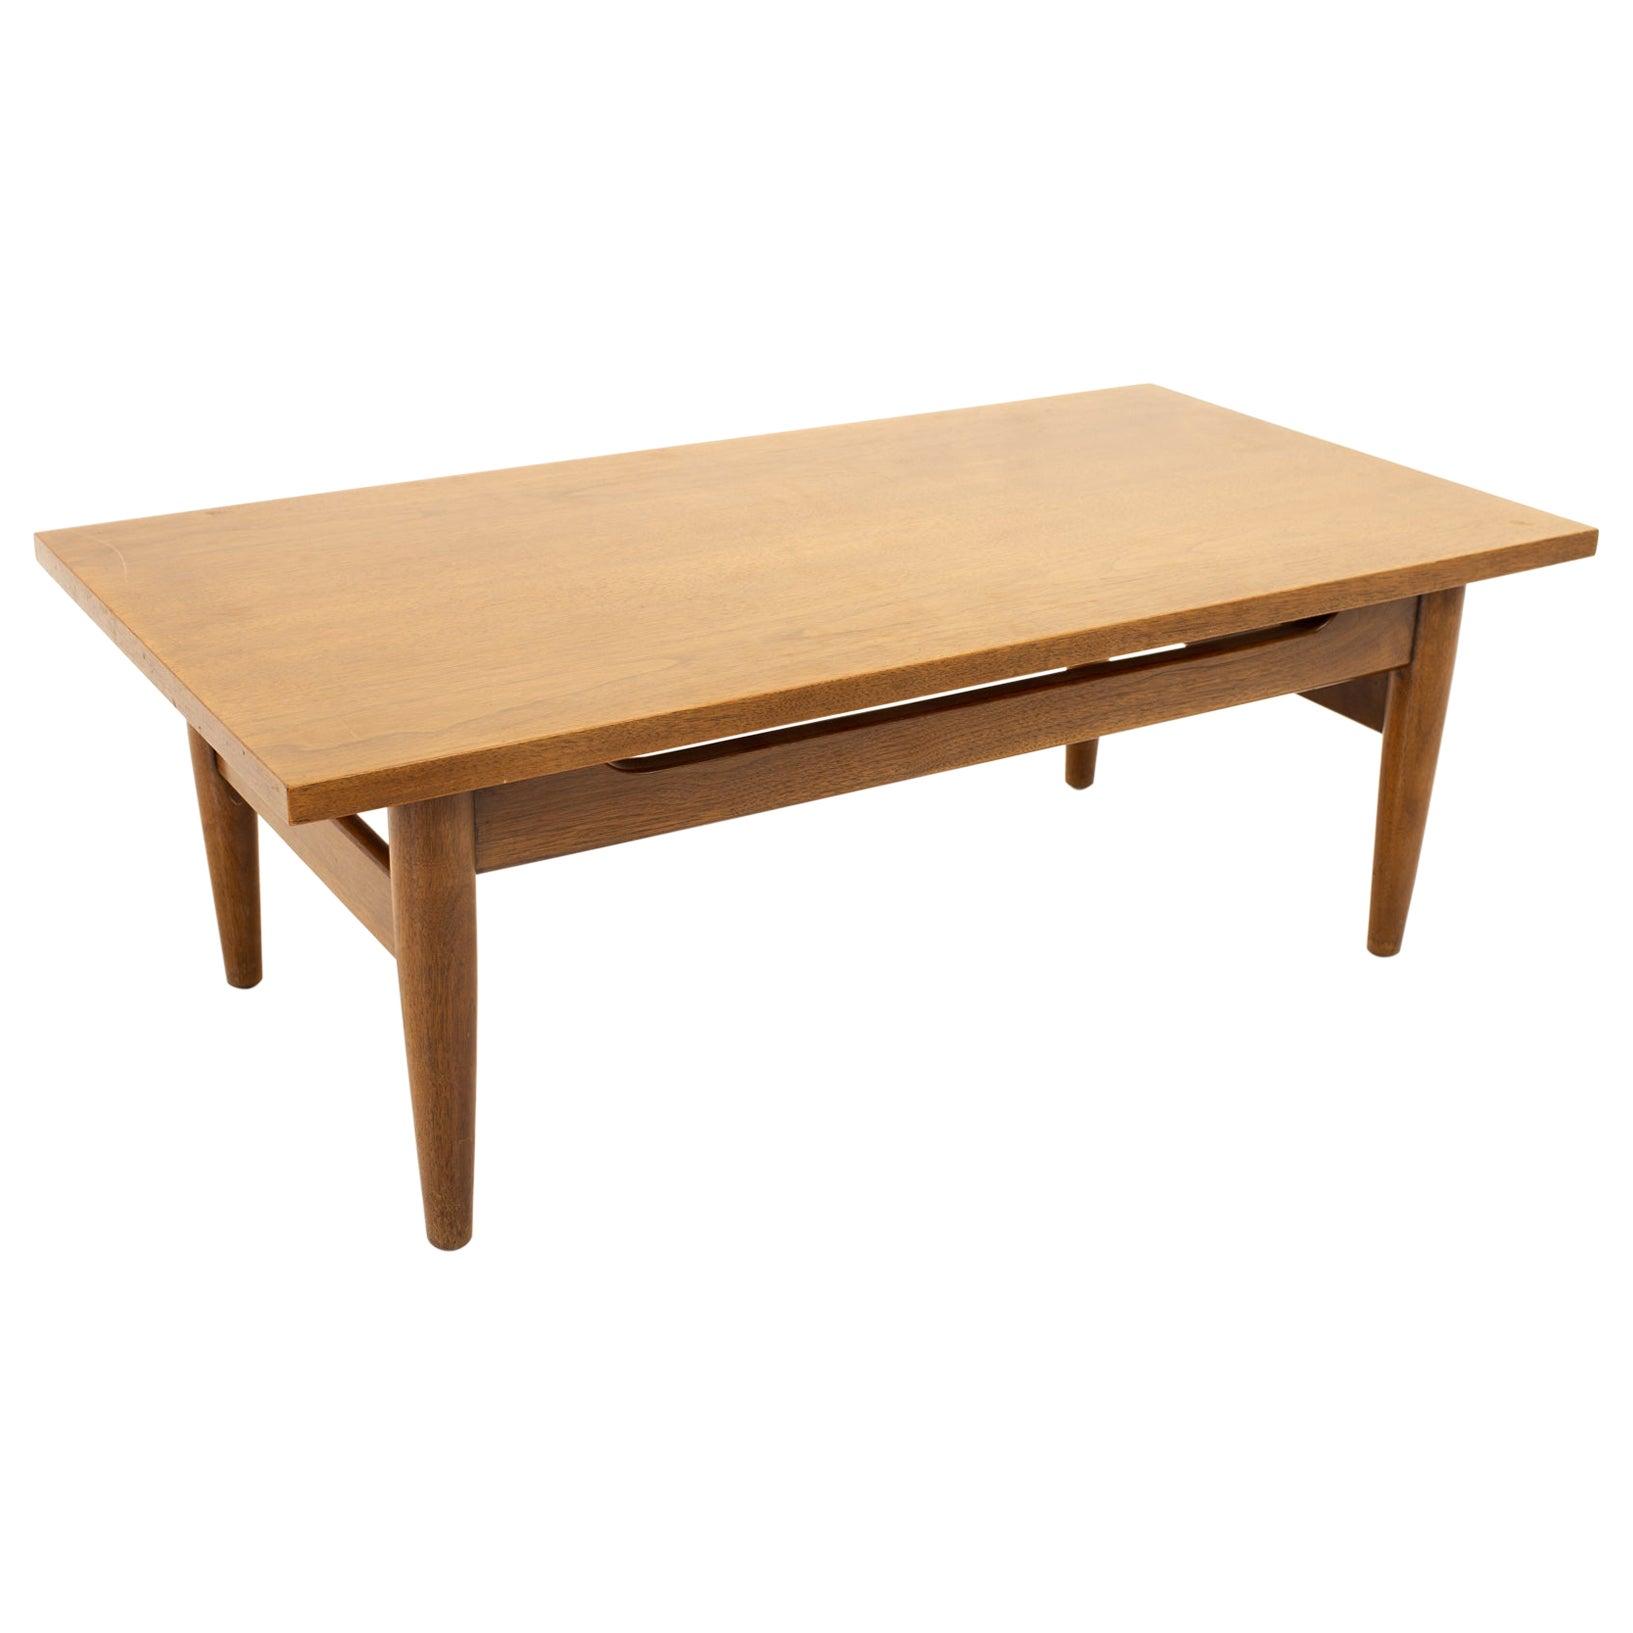 Jens Risom Style Midcentury Walnut Coffee Table